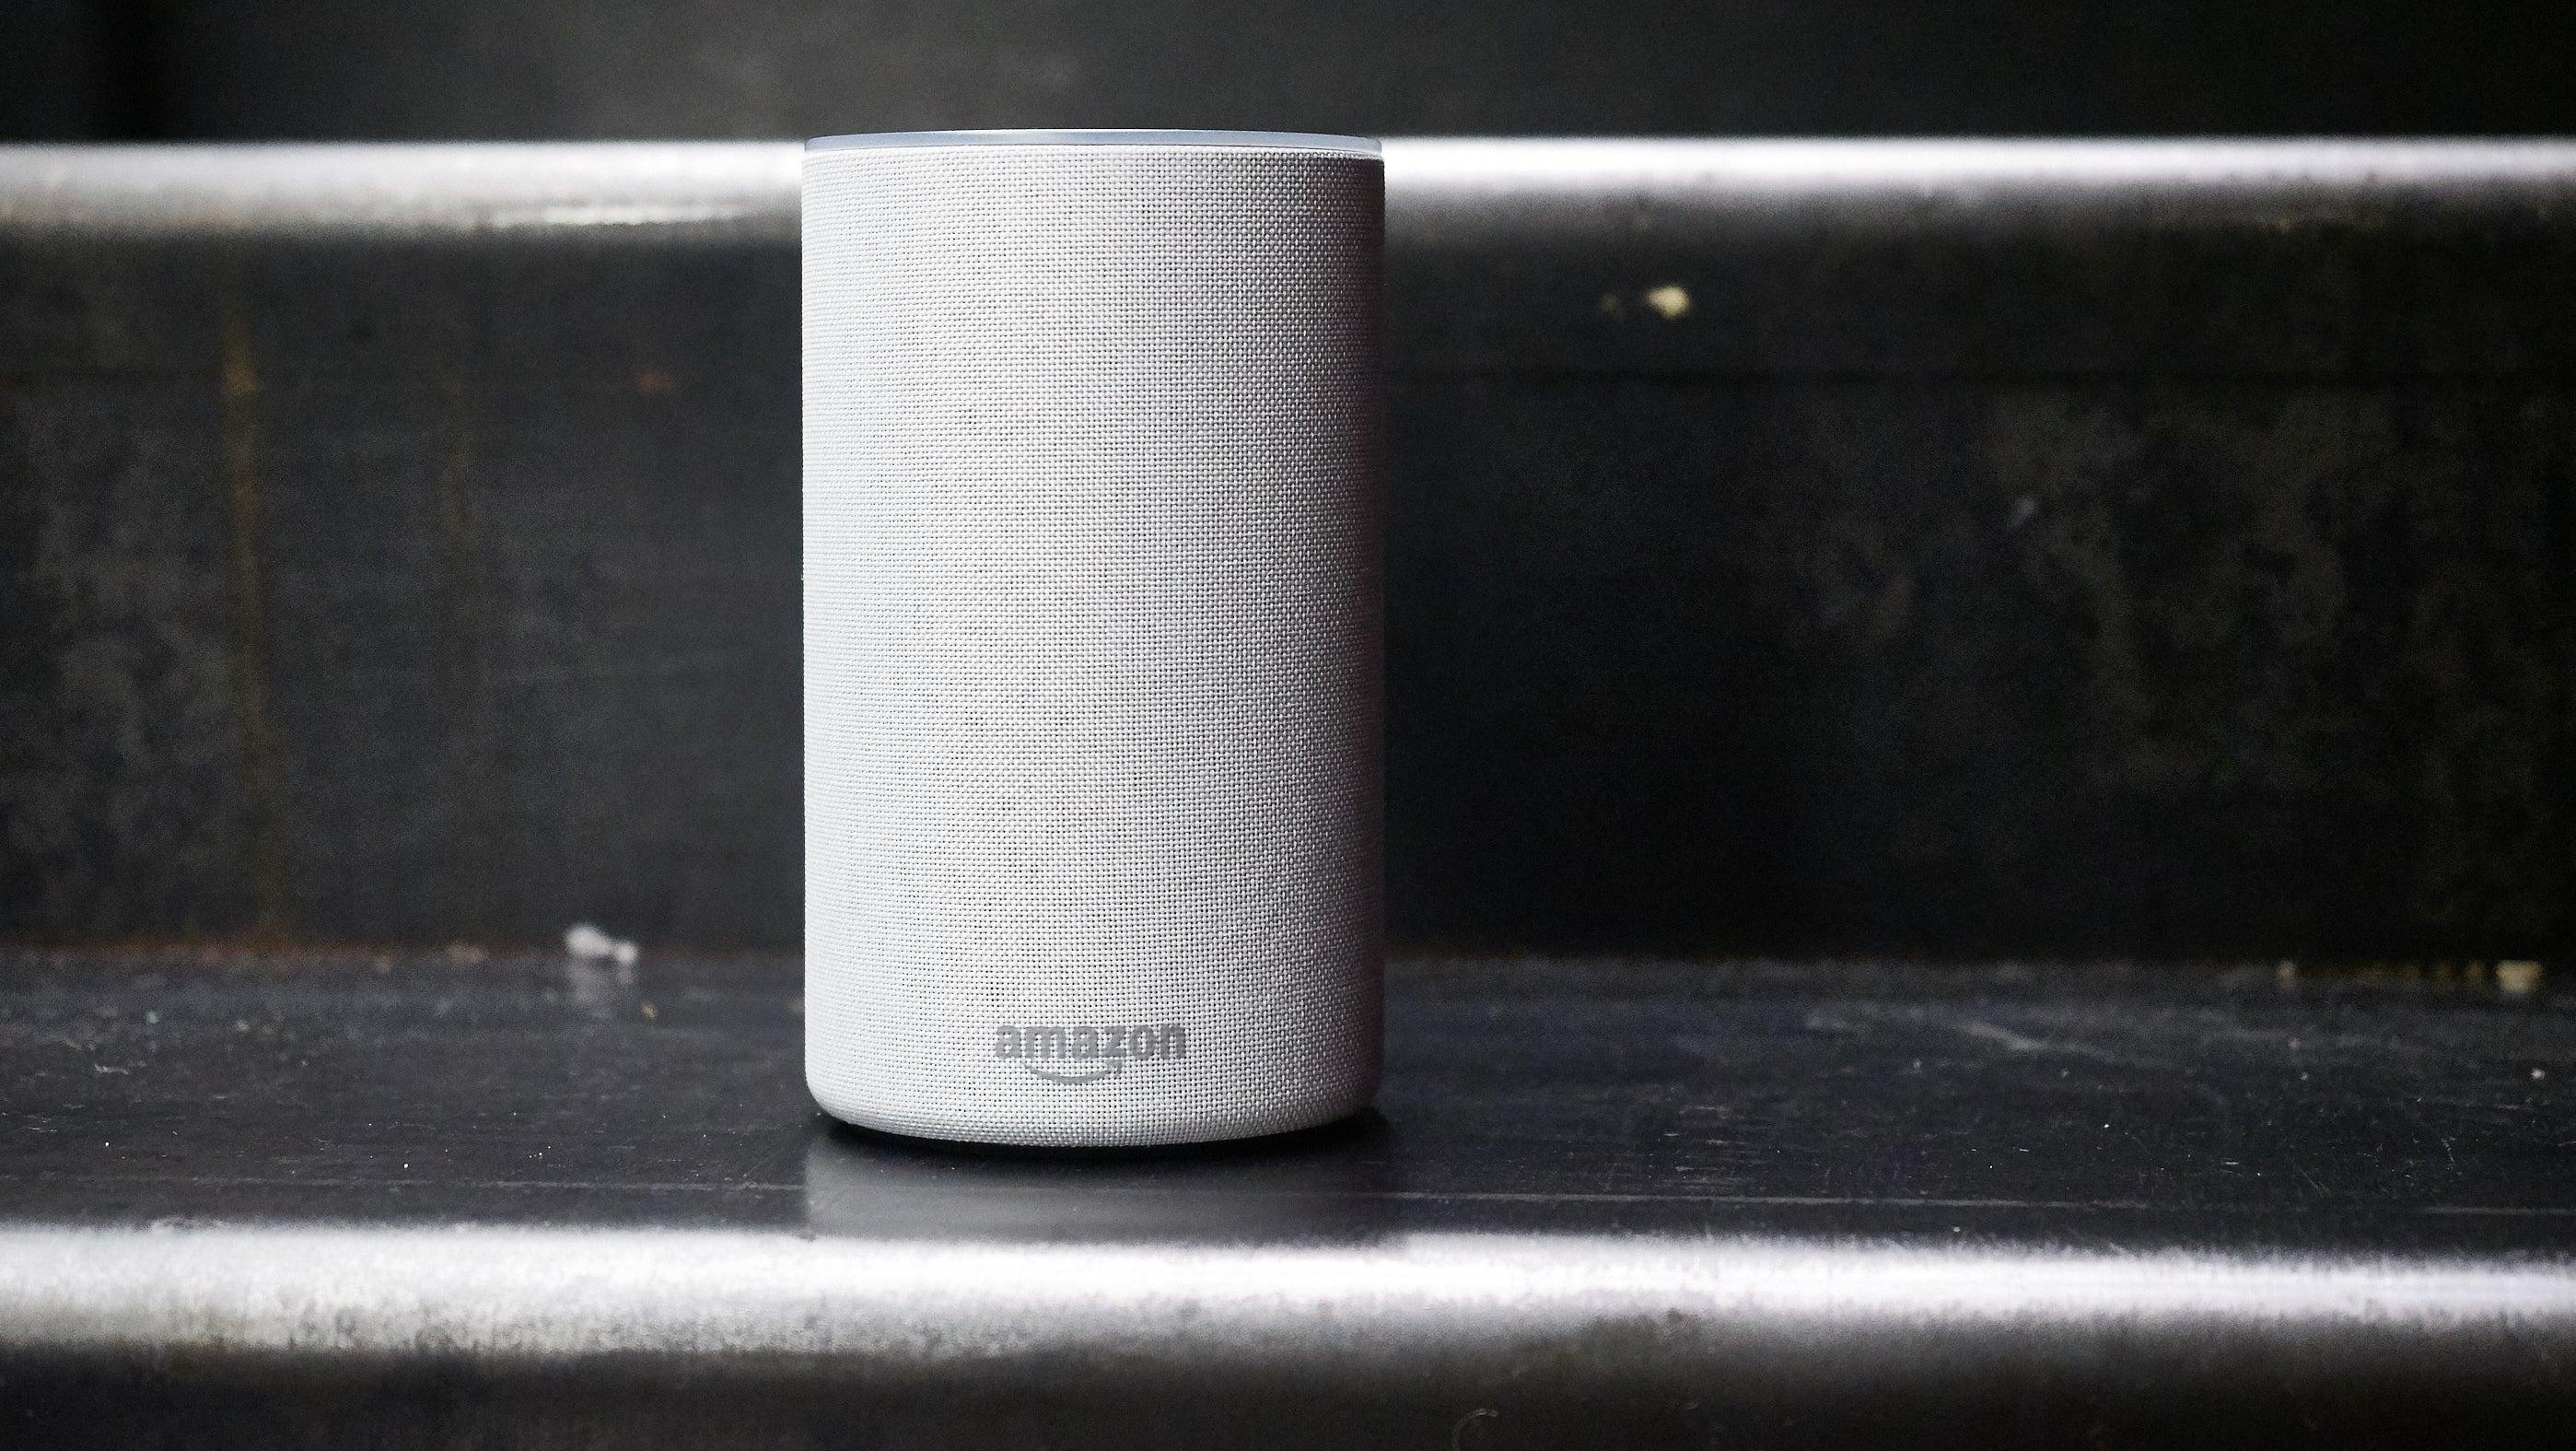 The Amazon Alexa Eavesdropping Nightmare Came True